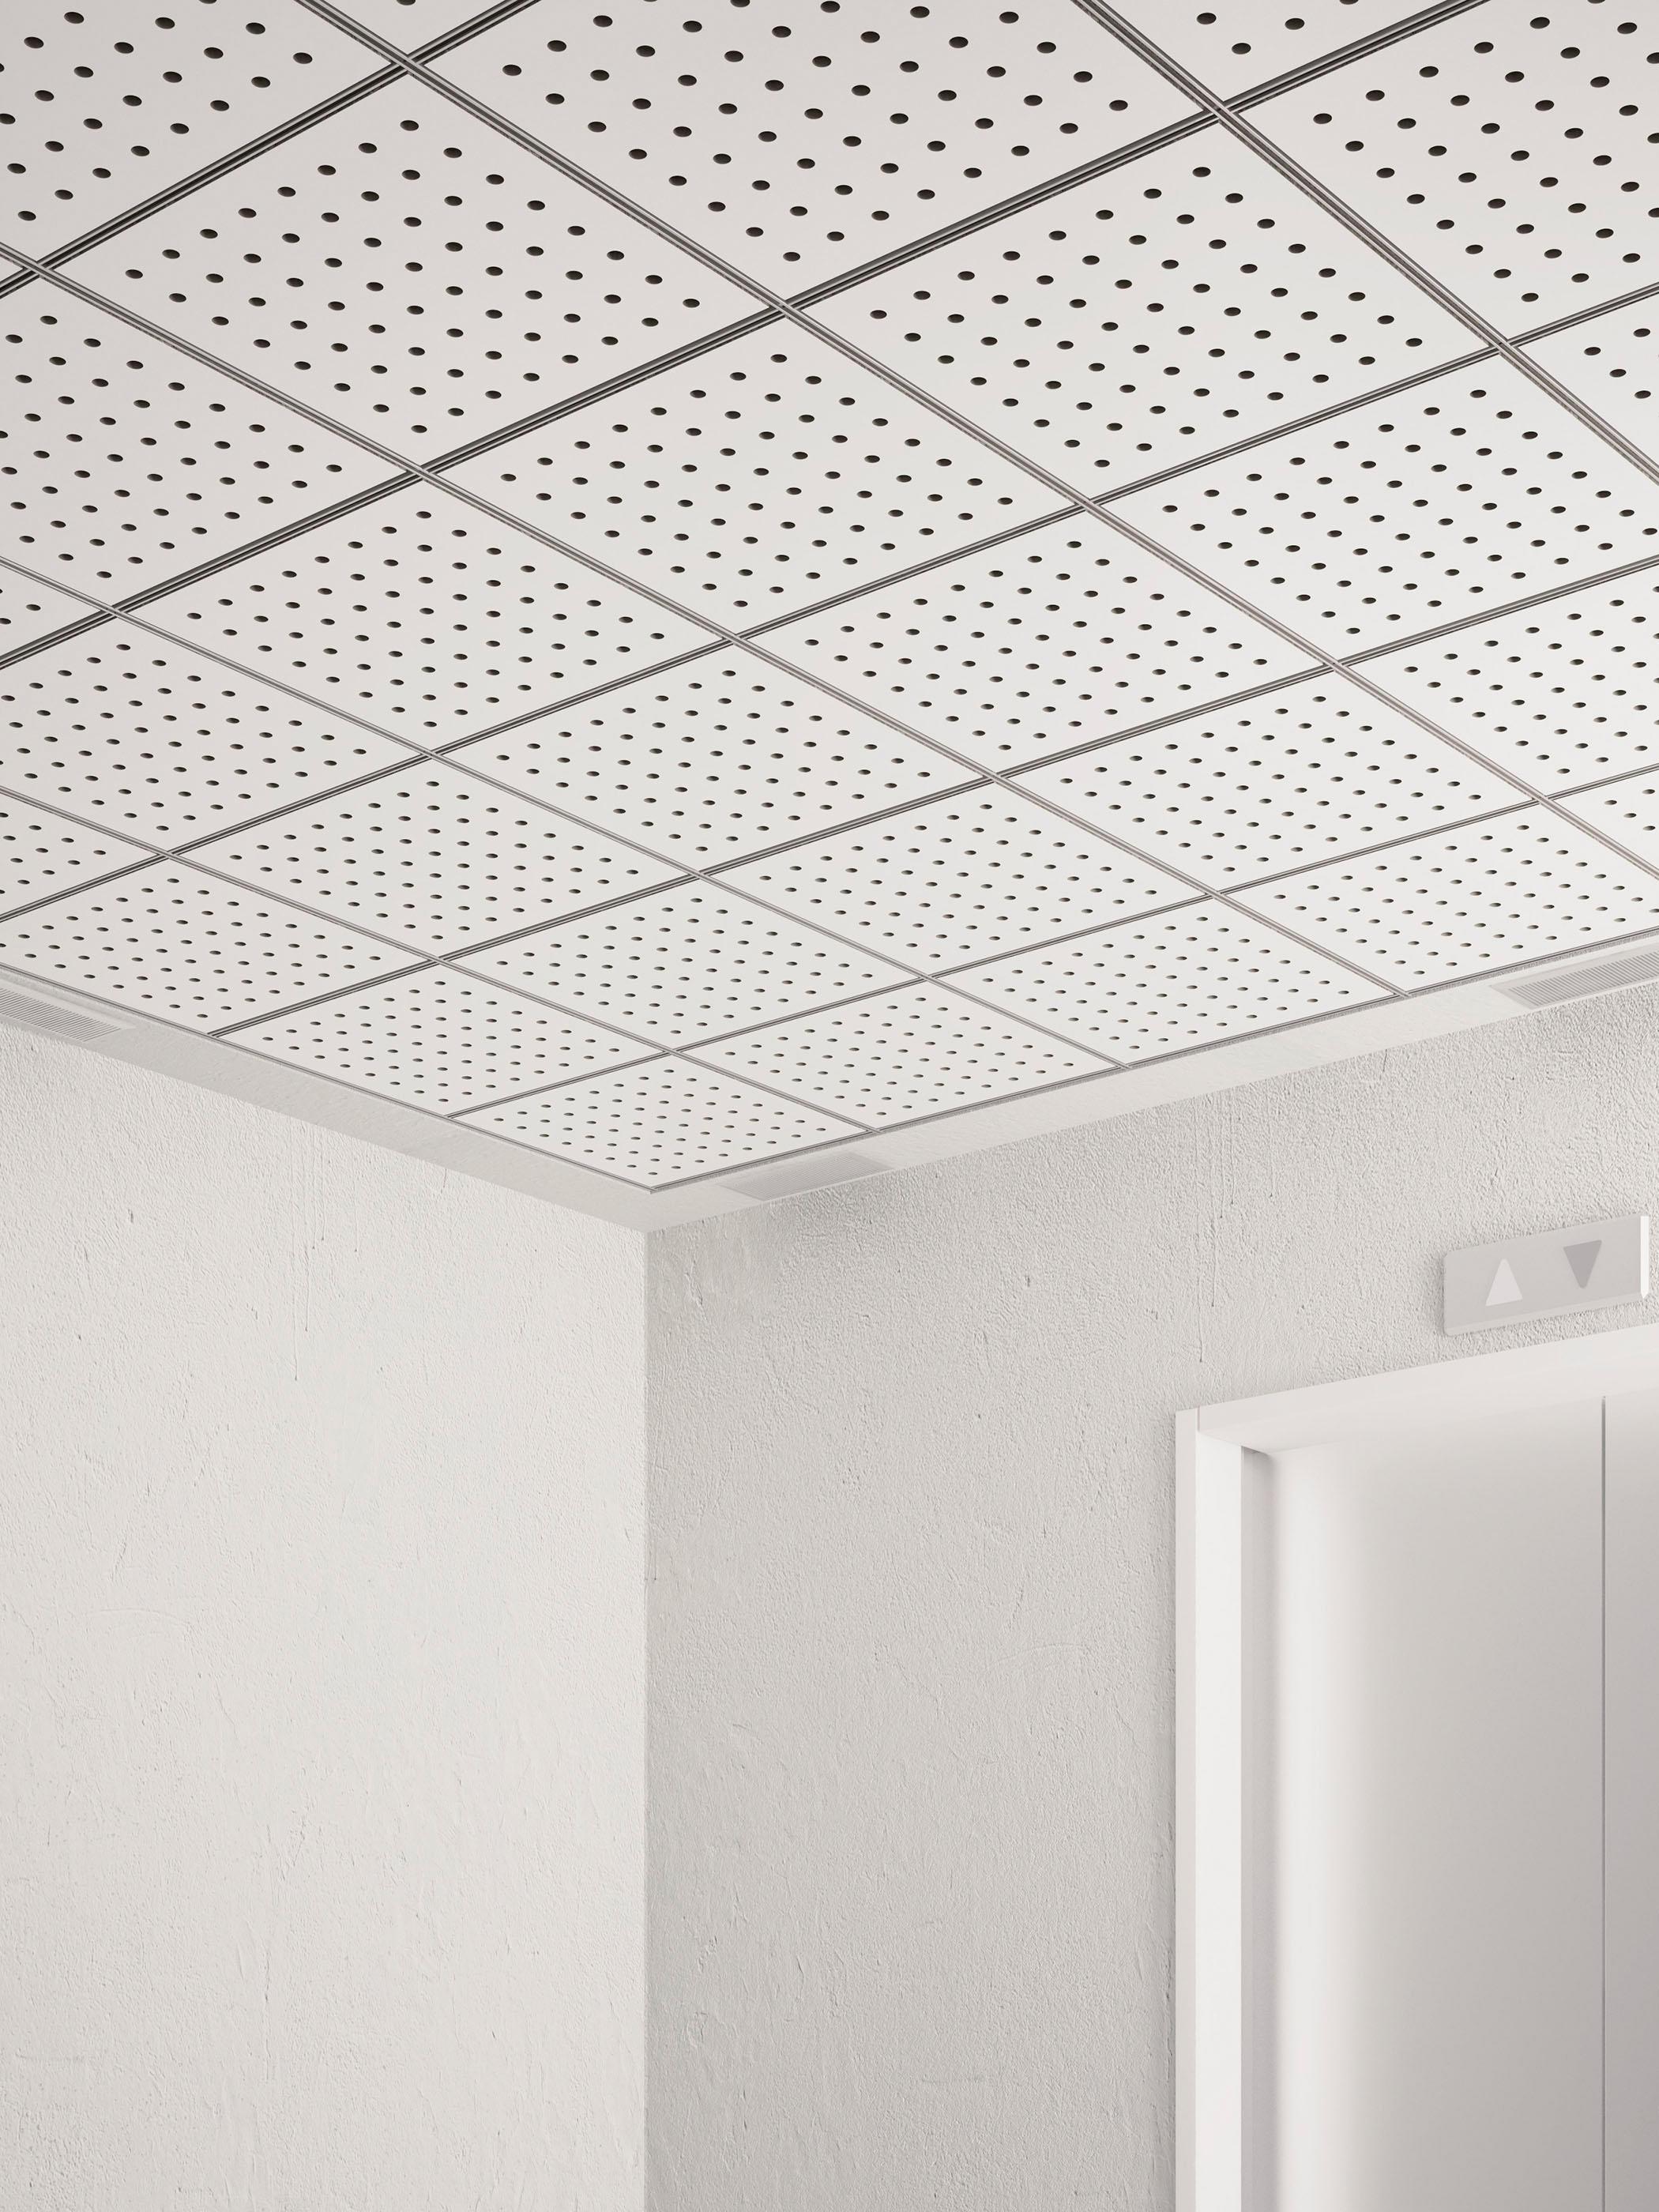 Unusual 12X24 Ceramic Tile Huge 16 X 24 Tile Floor Patterns Rectangular 2 X 12 Subway Tile 2 X 4 Subway Tile Old 2 X 6 Subway Tile Backsplash Soft2X4 Glass Tile Backsplash 60X60 | 60X120 SYSTEM   Square Panels From Fantoni | Architonic